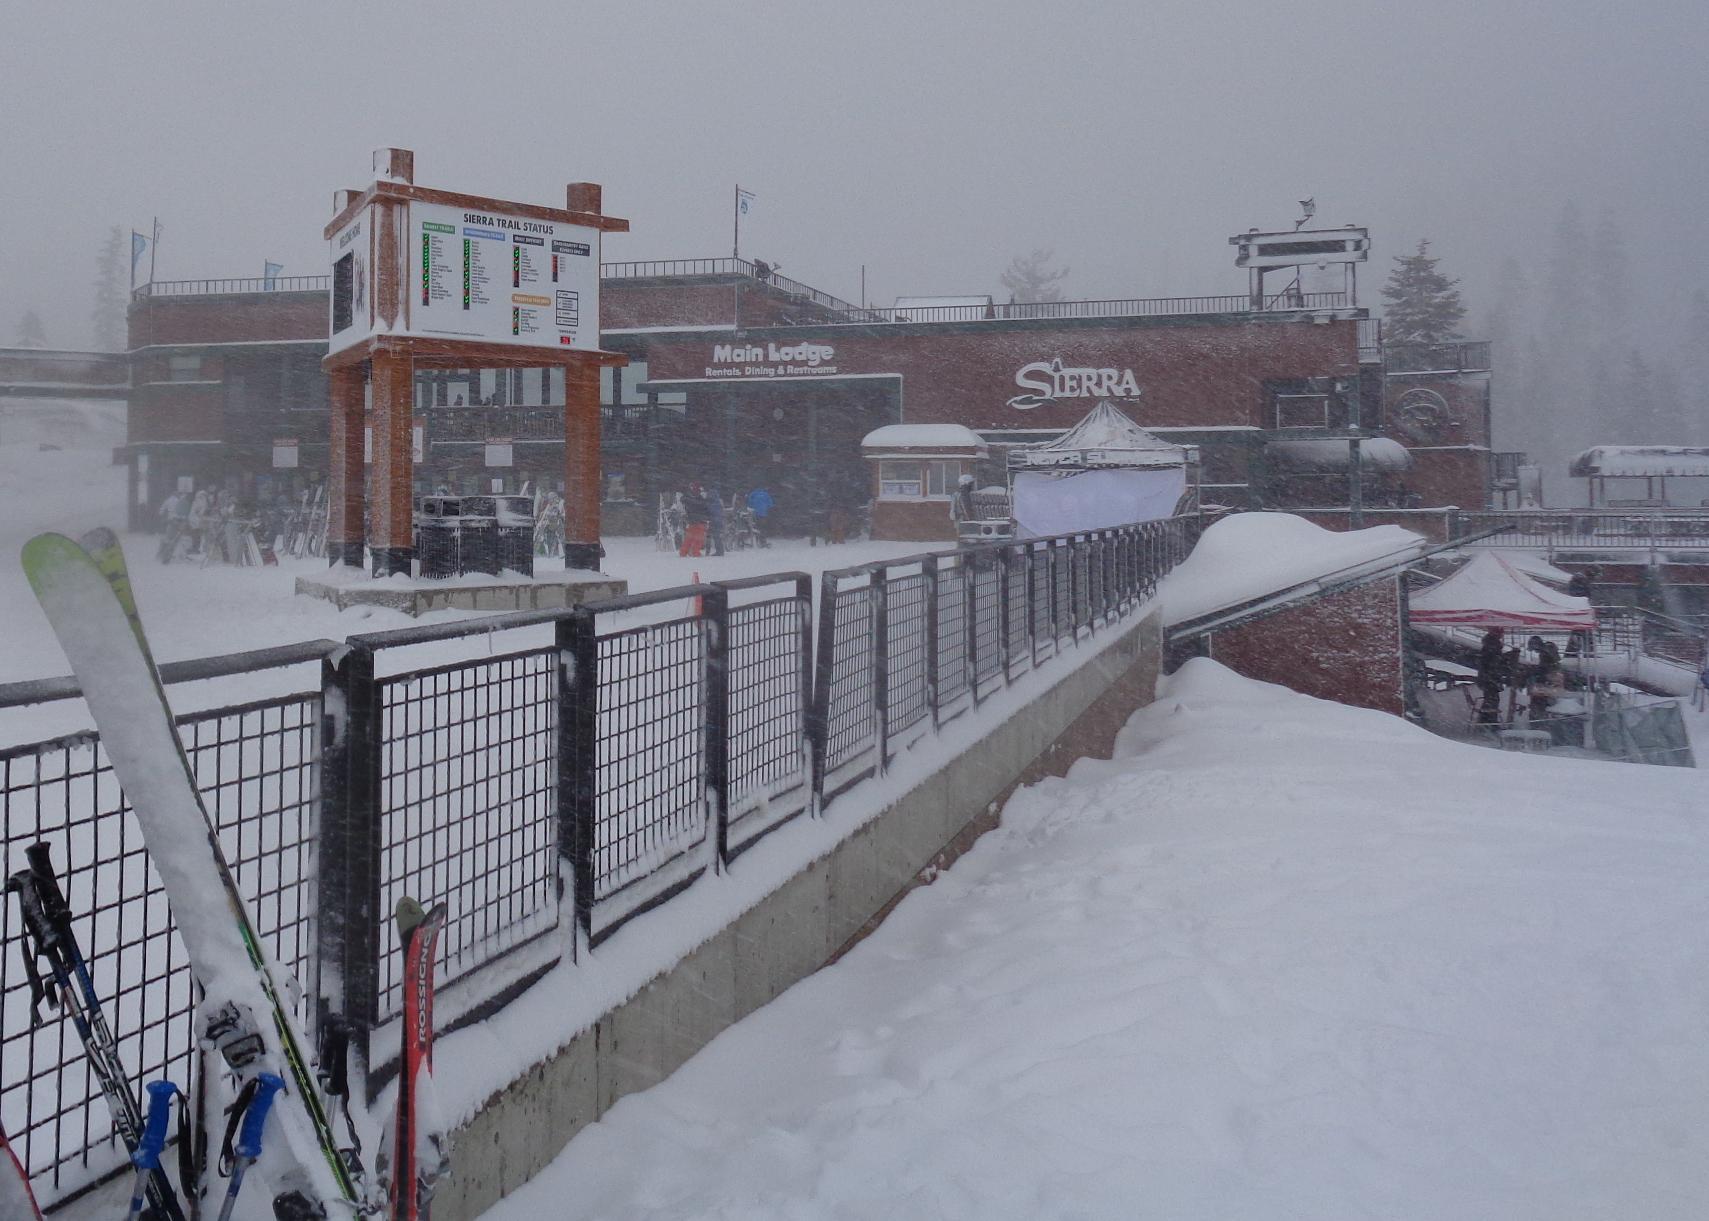 Sierra Base Snowfall area